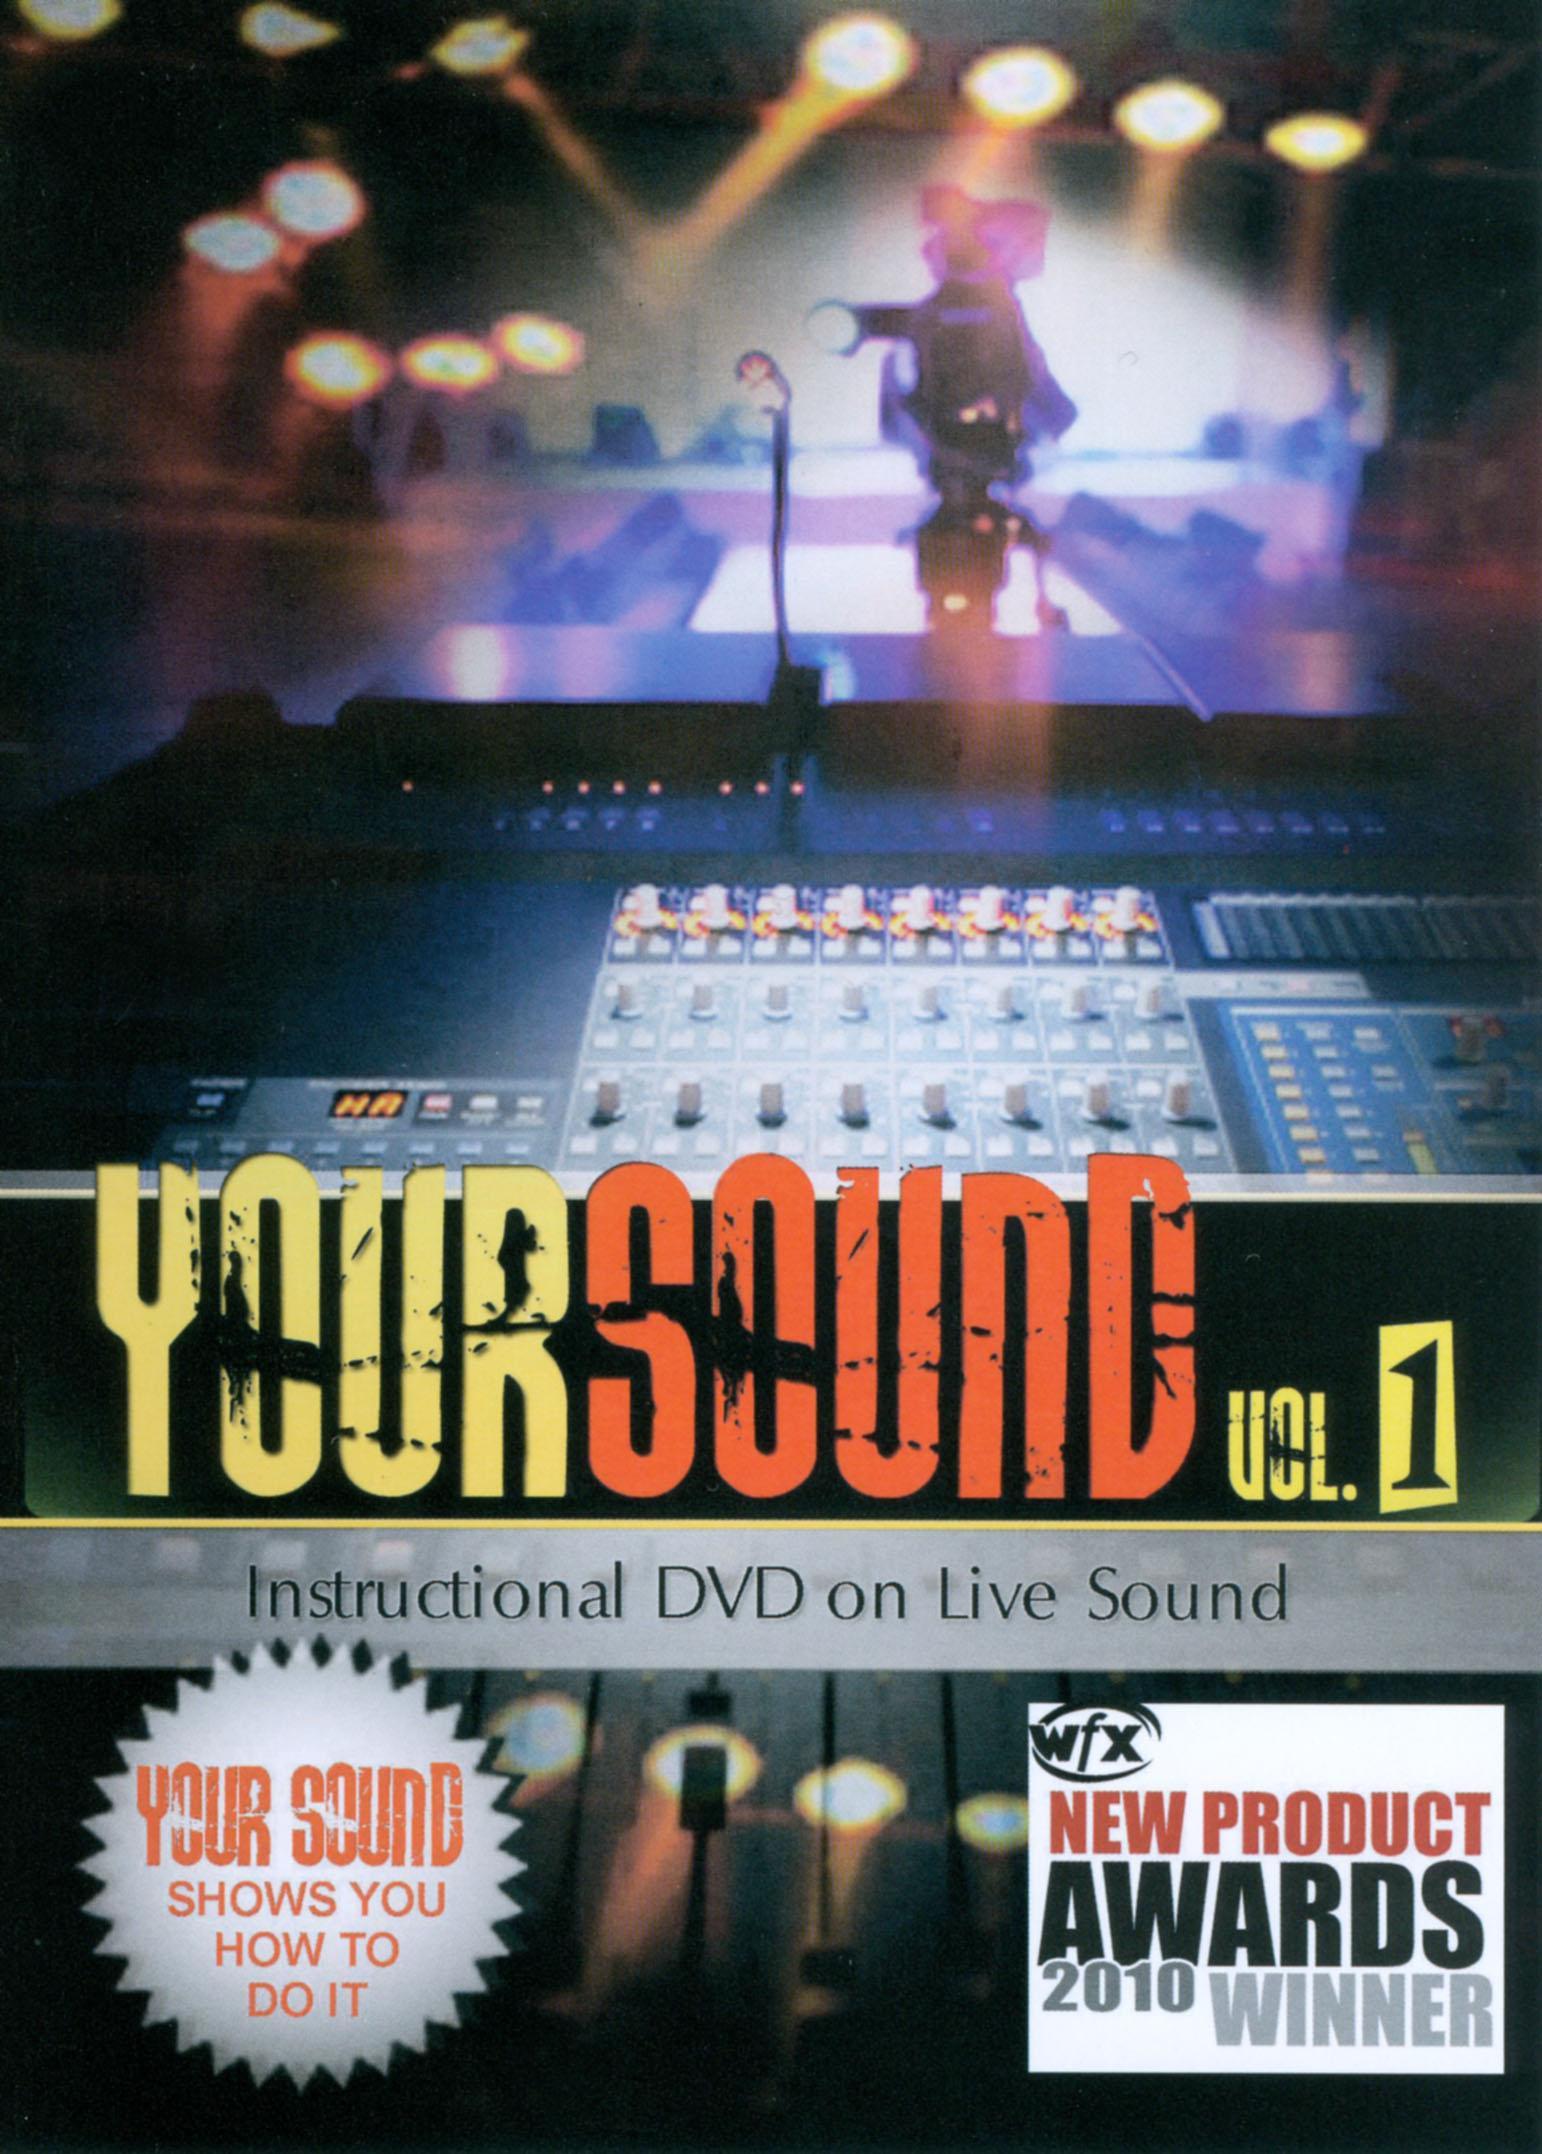 Your Sound, Vol. 1: Instructional DVD on Live Sound